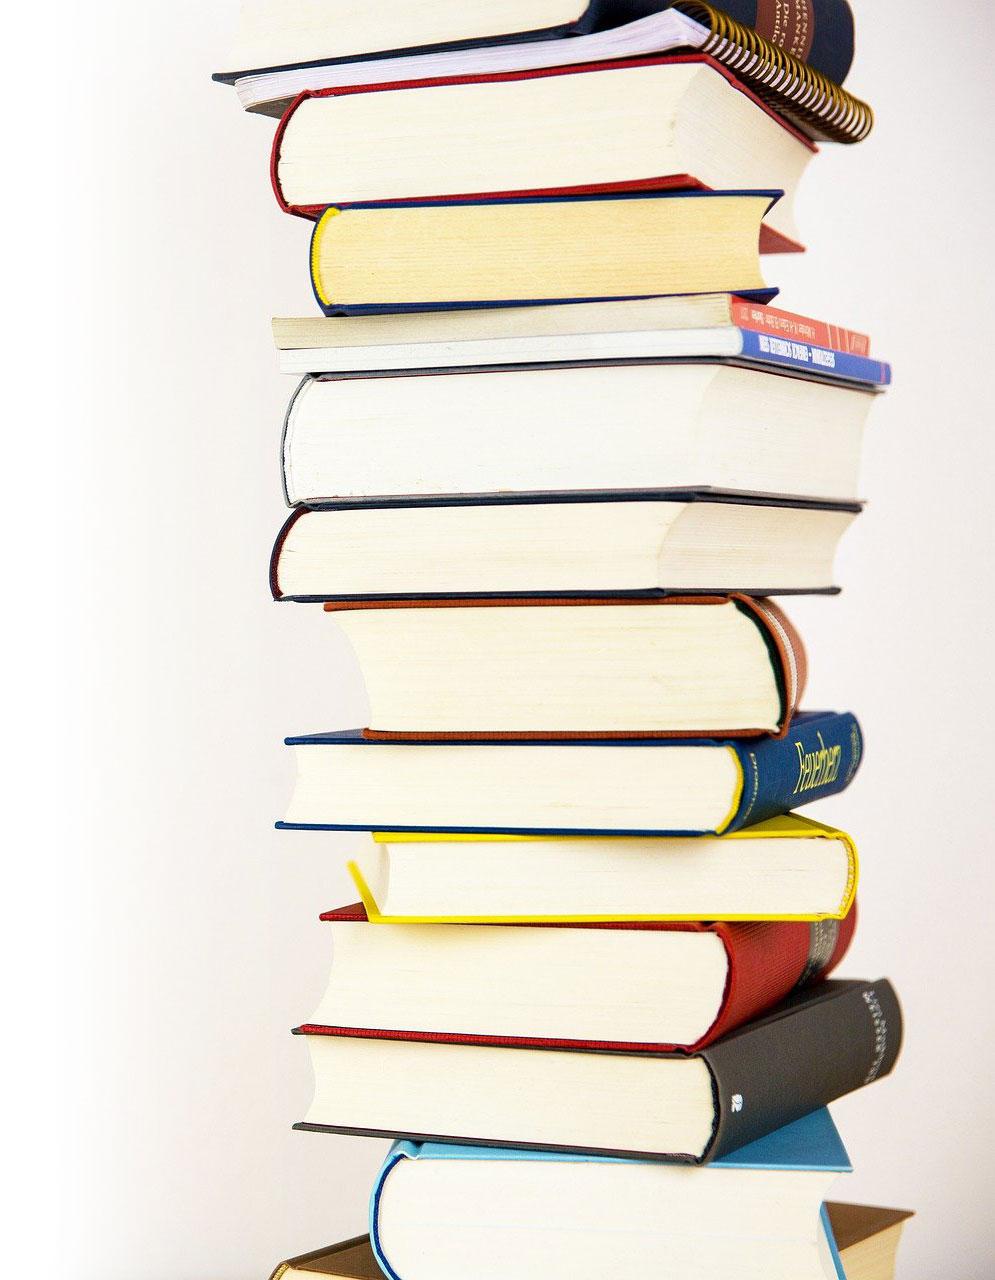 books-5937823_1920_tagliata